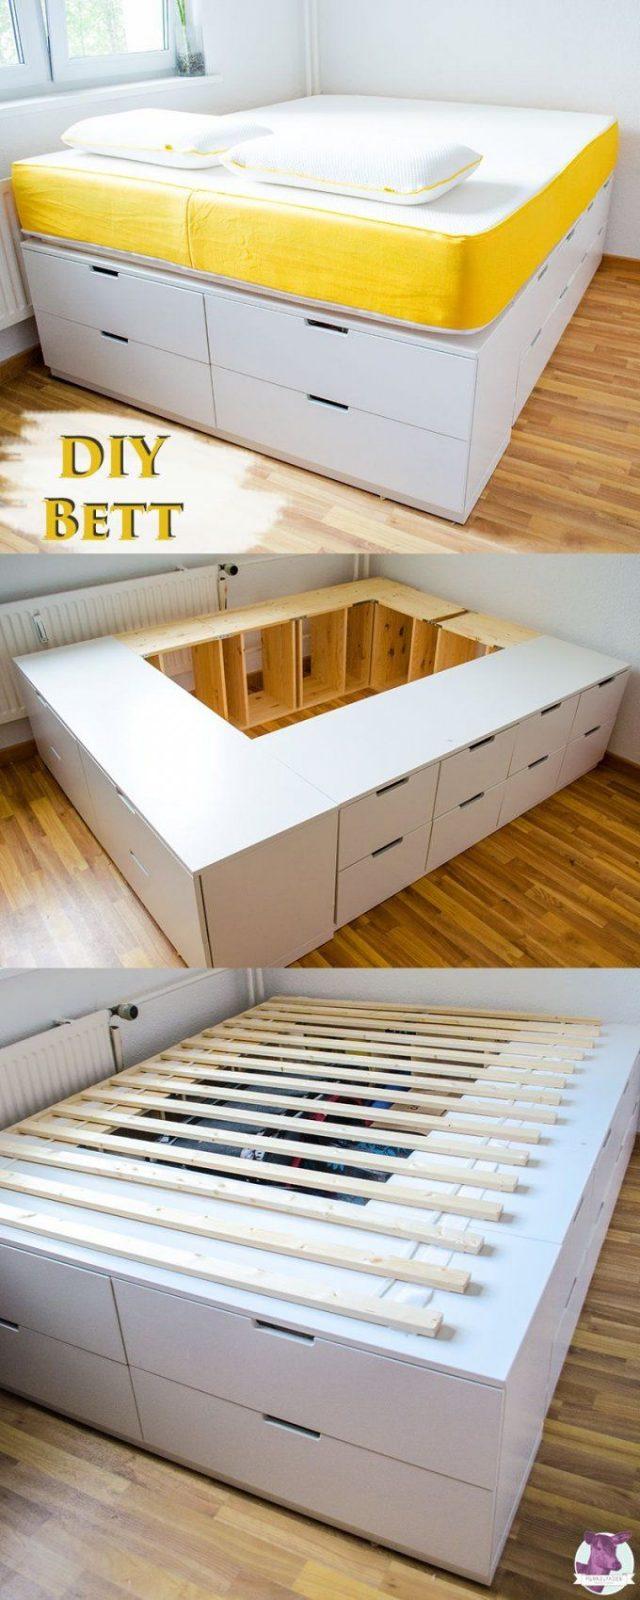 Diy Ikea Hack  Plattformbett Selber Bauen Aus Ikea Kommoden von Bett Ideen Selber Bauen Photo